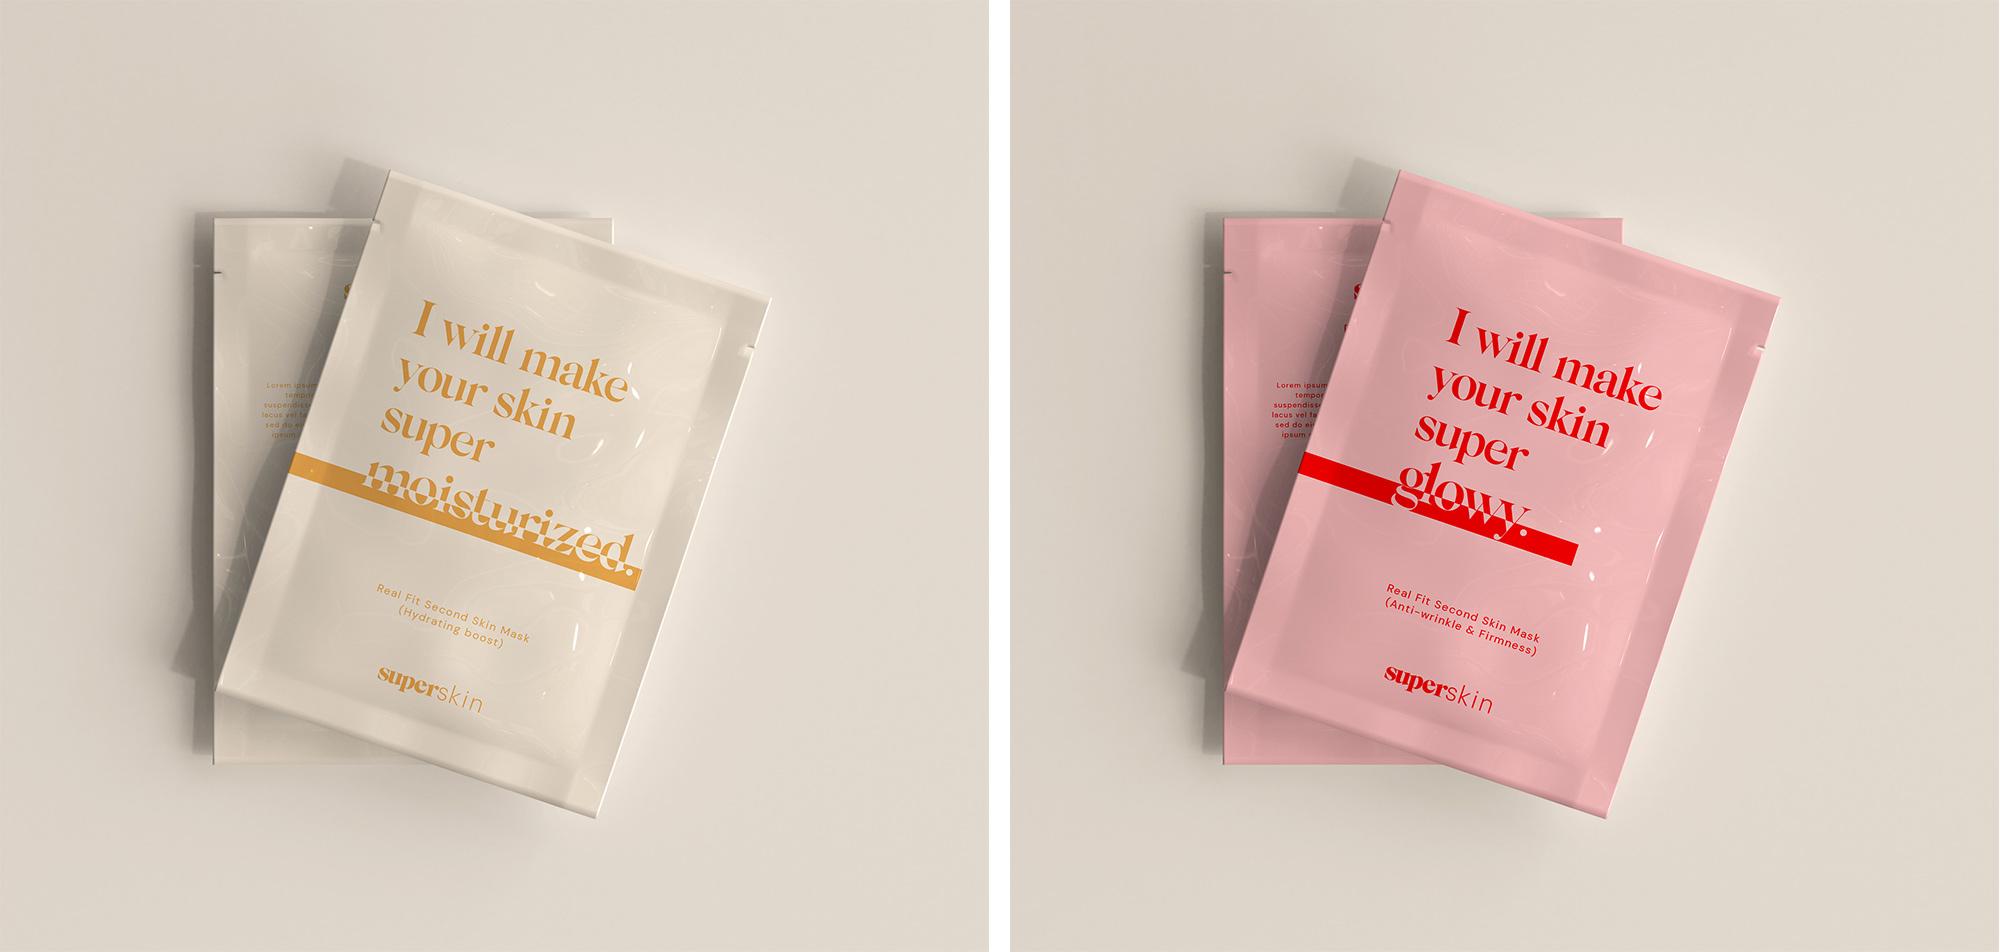 superskin-skincare-branding-packaging-glowy-mosturized